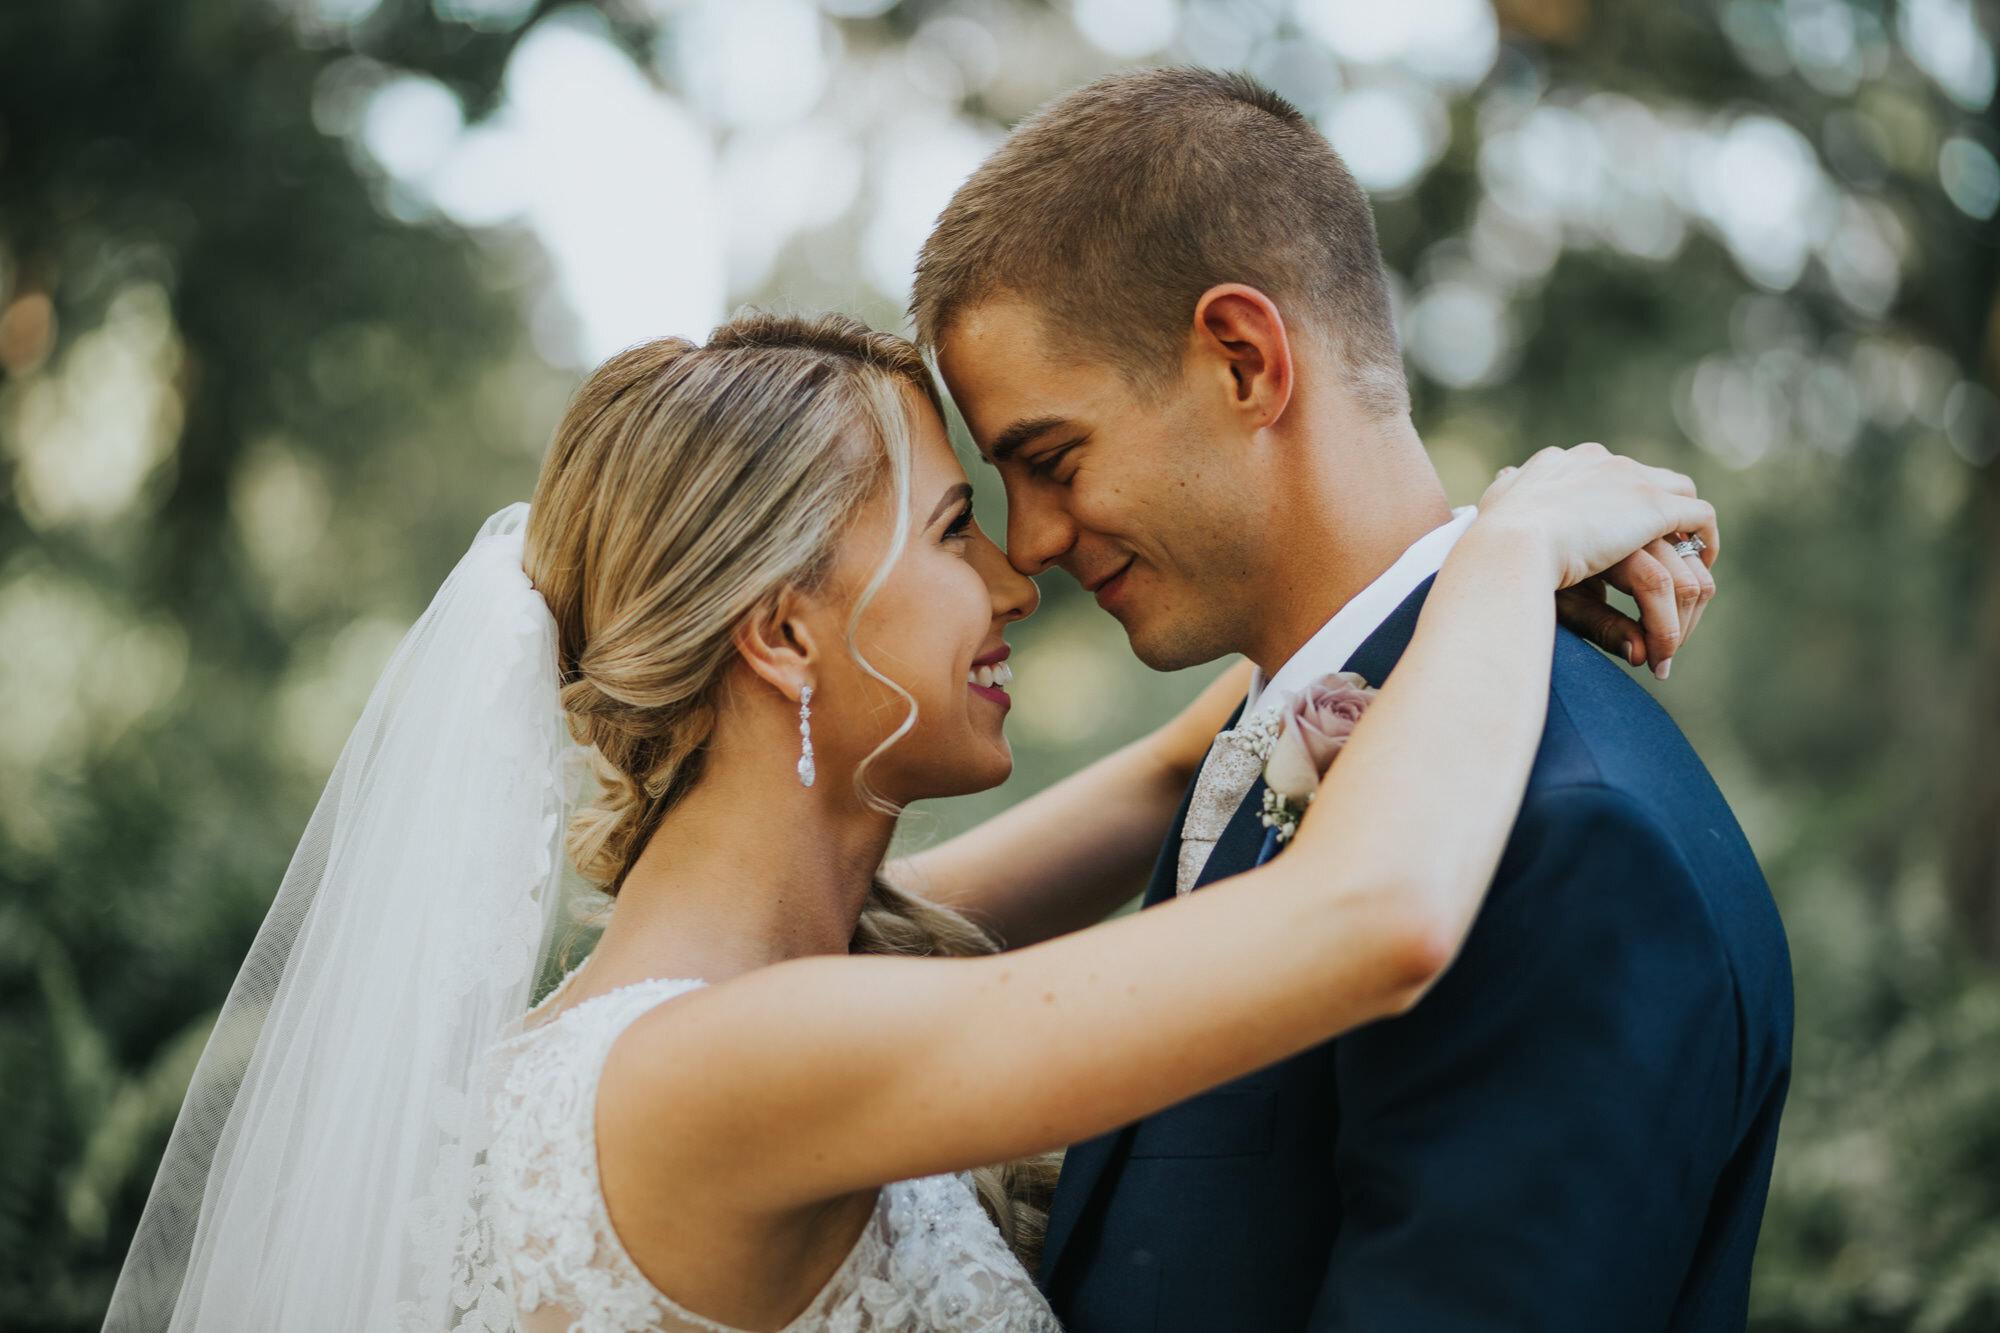 323Sean_Emily_Wedding_3-30-19.jpg